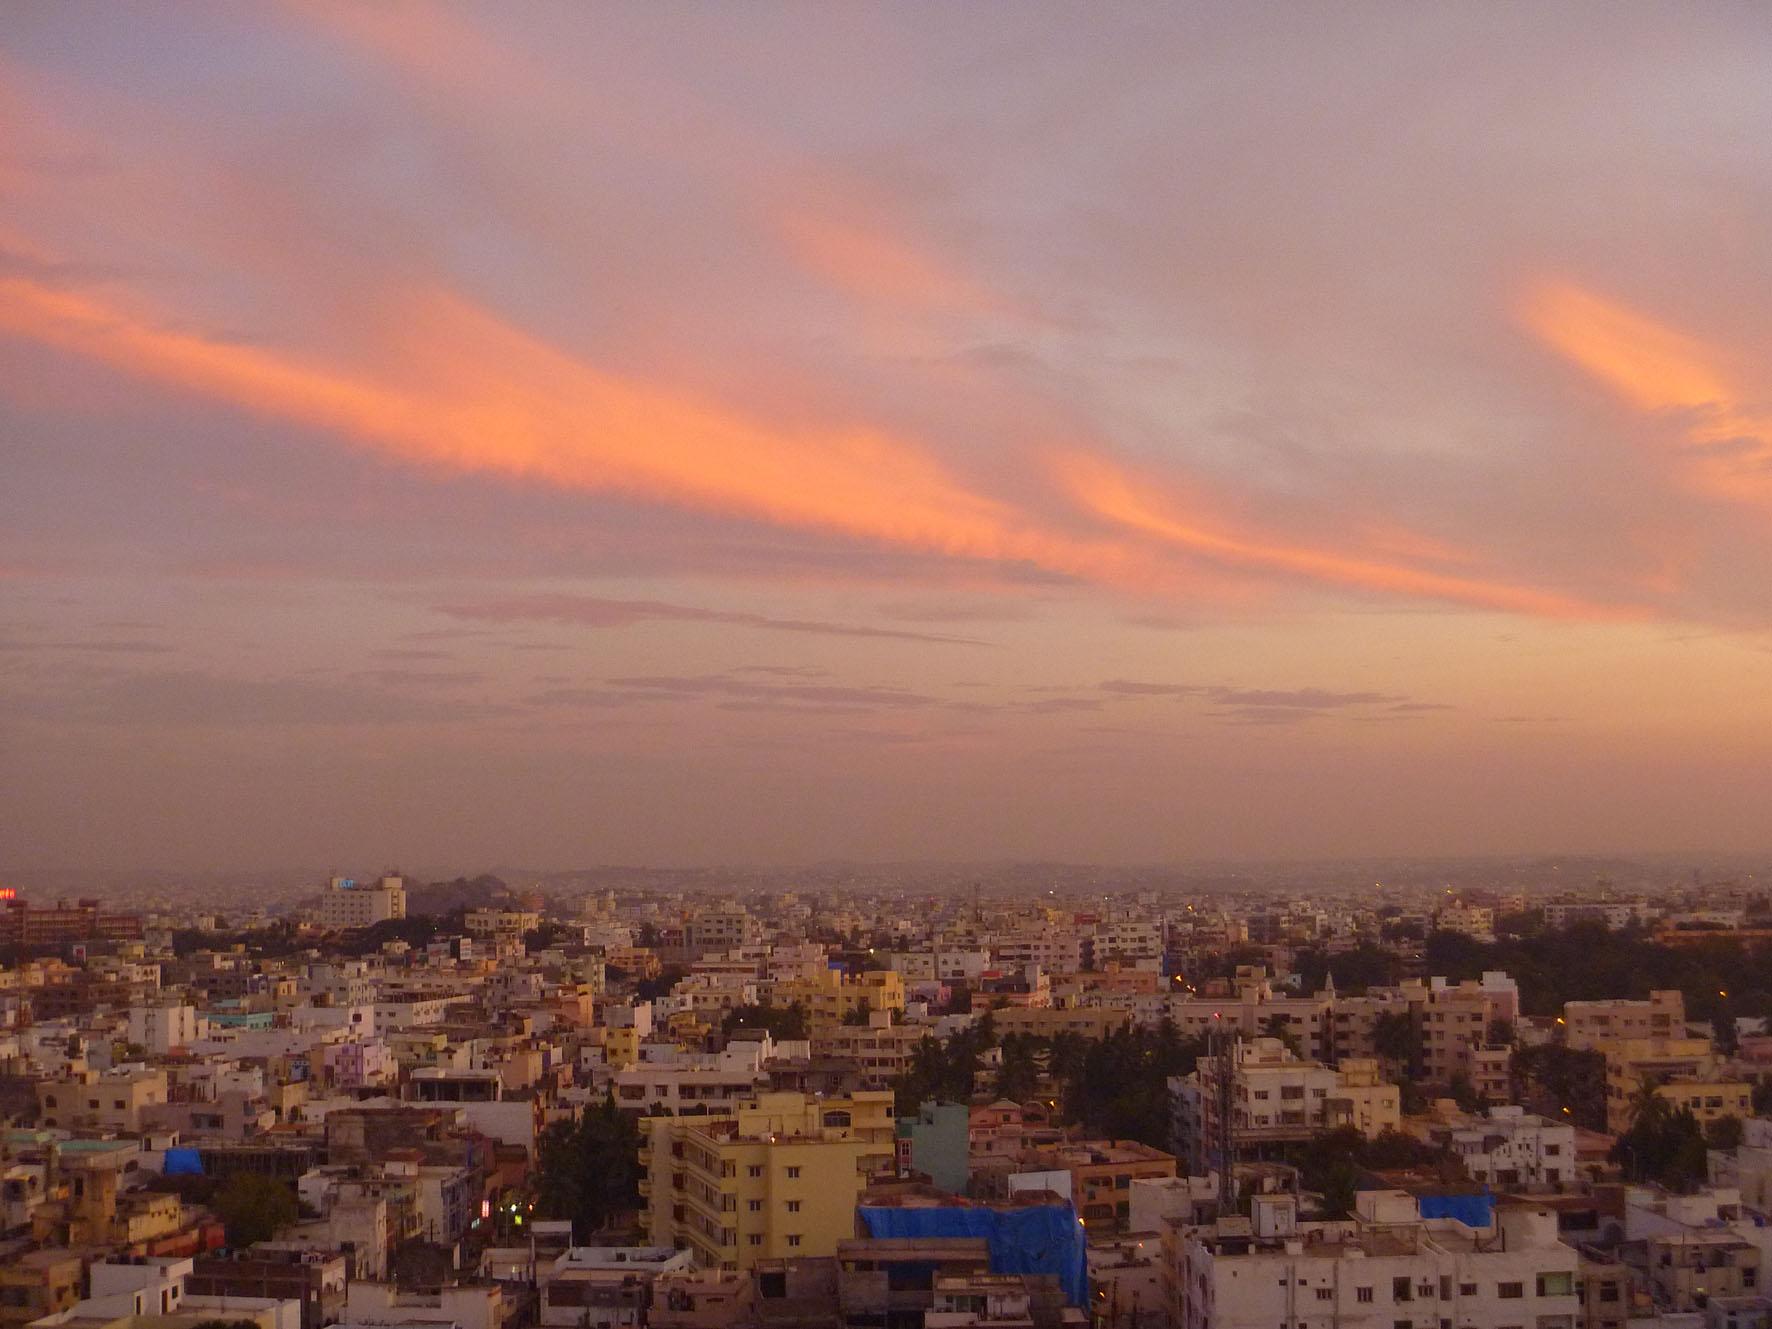 2011_Hyderabad Amrutha Valley 418_146 KOPIE S